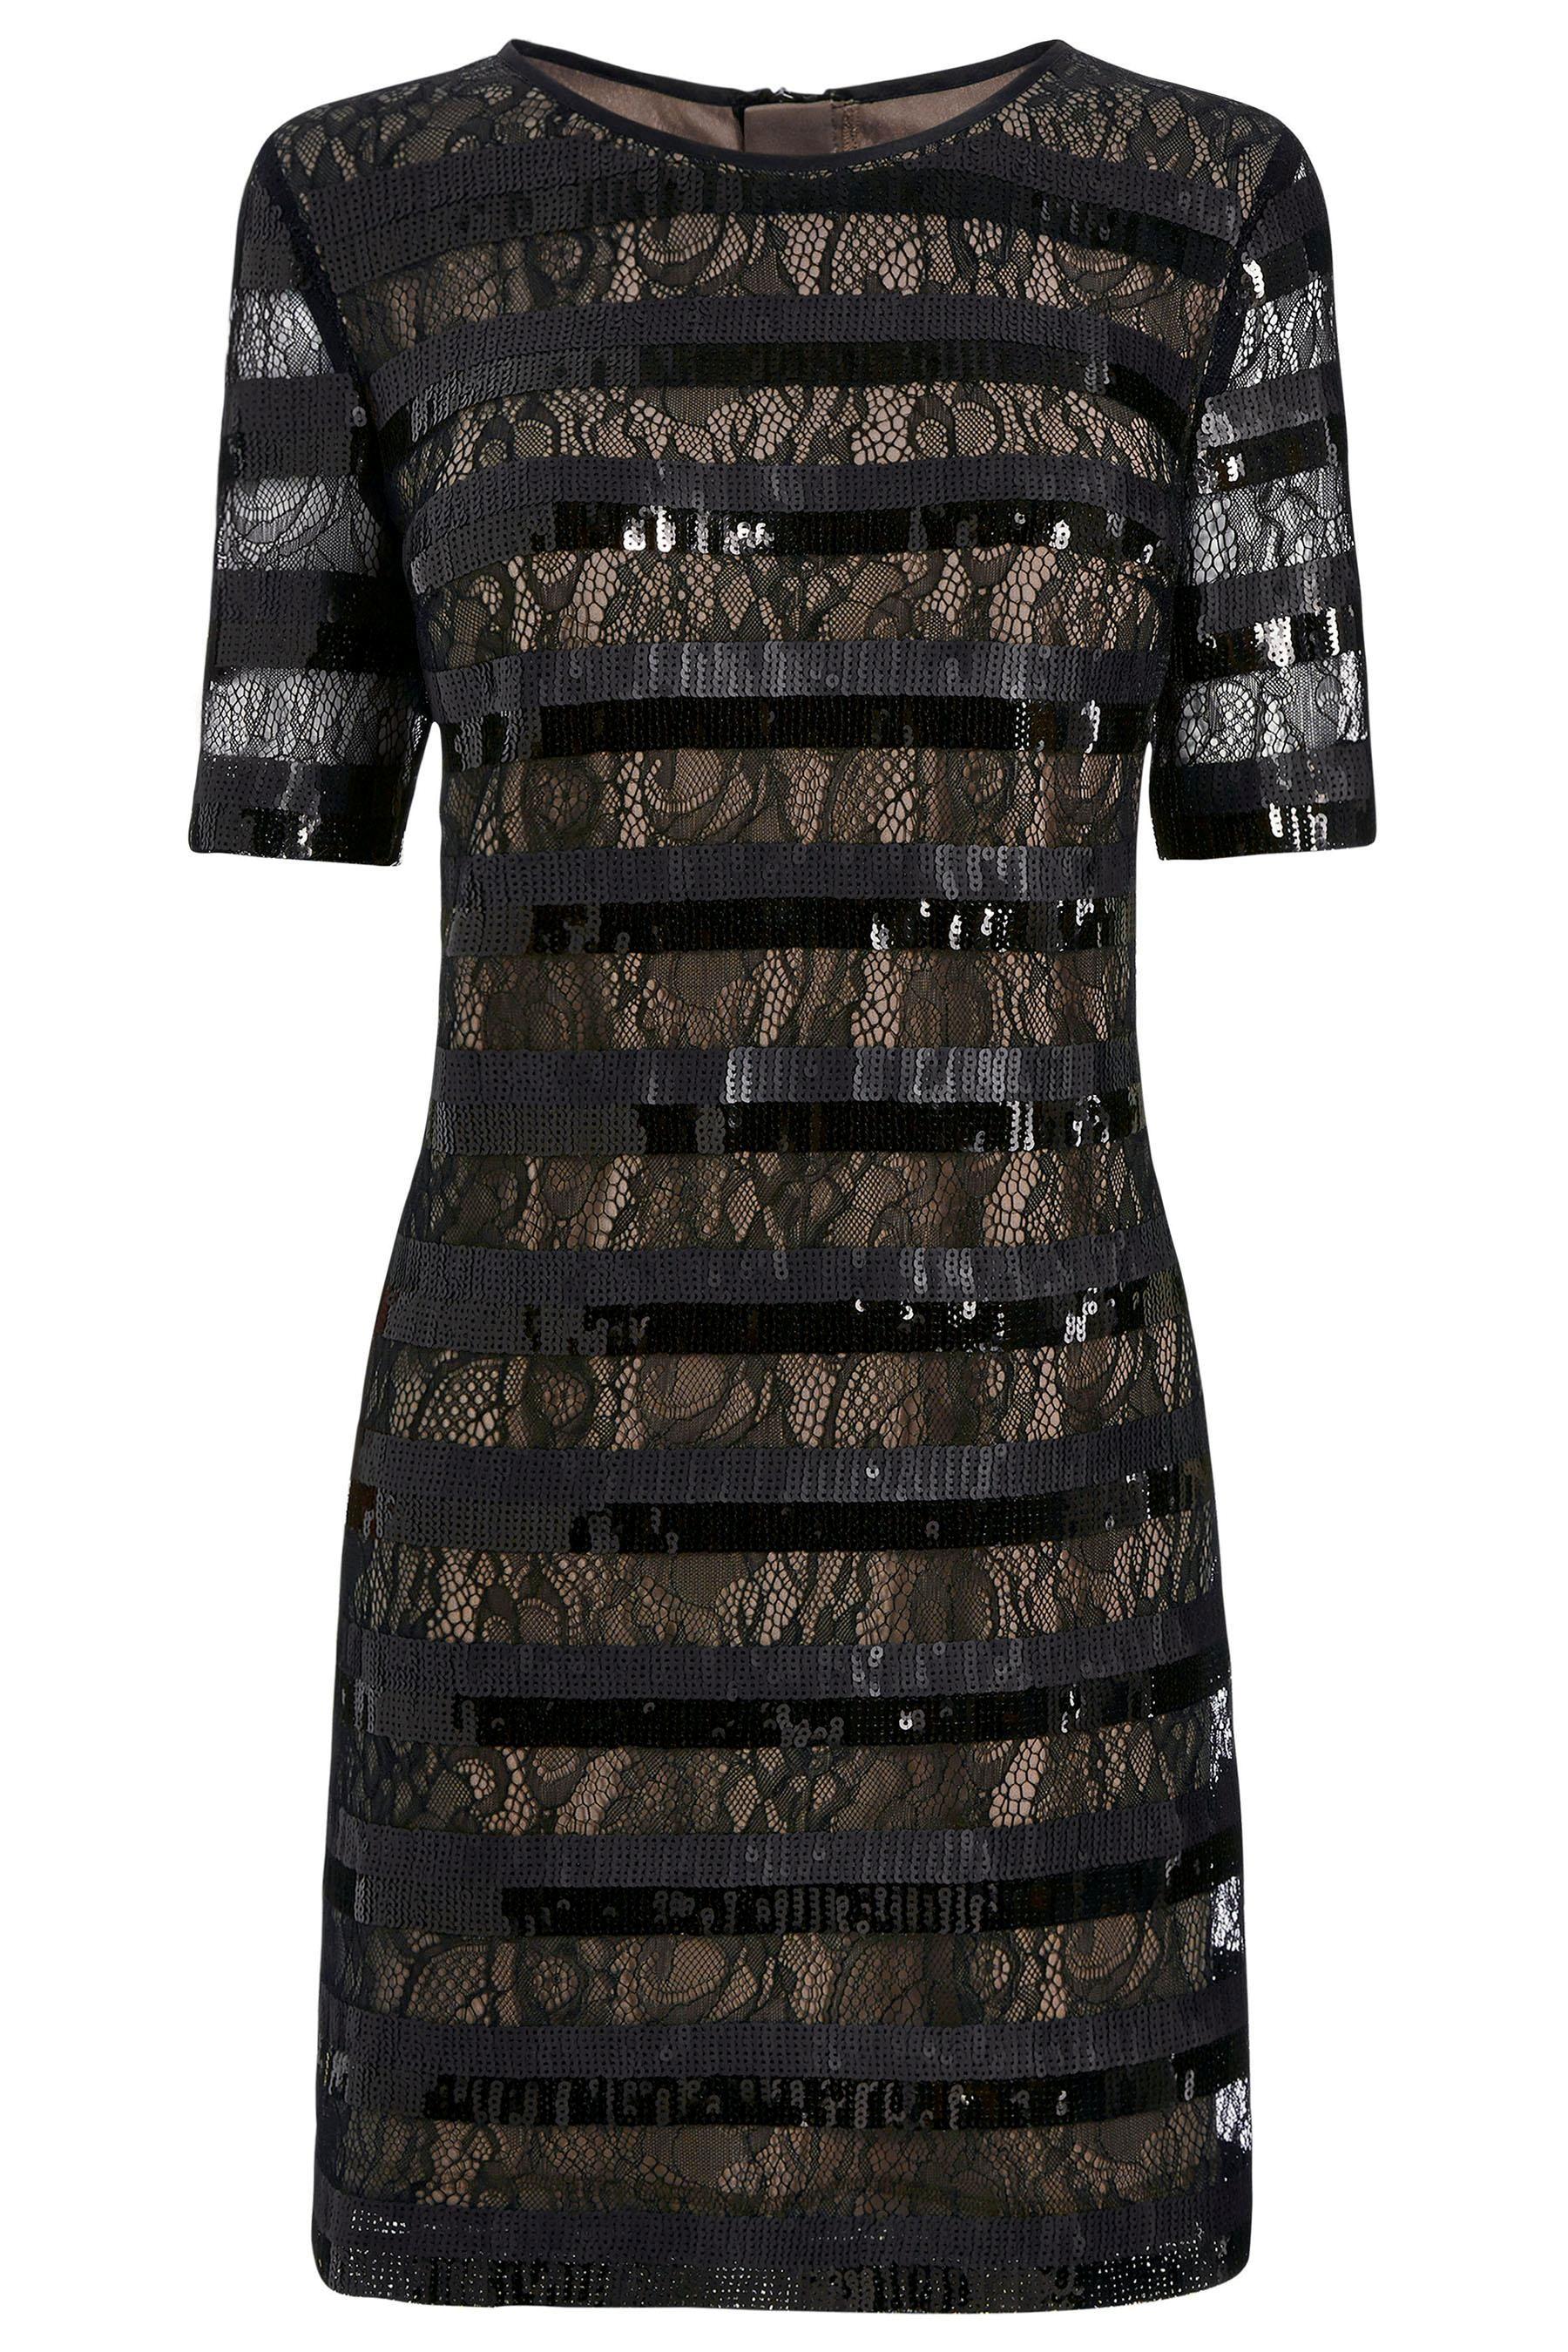 Stripe Sequin Dress by Next